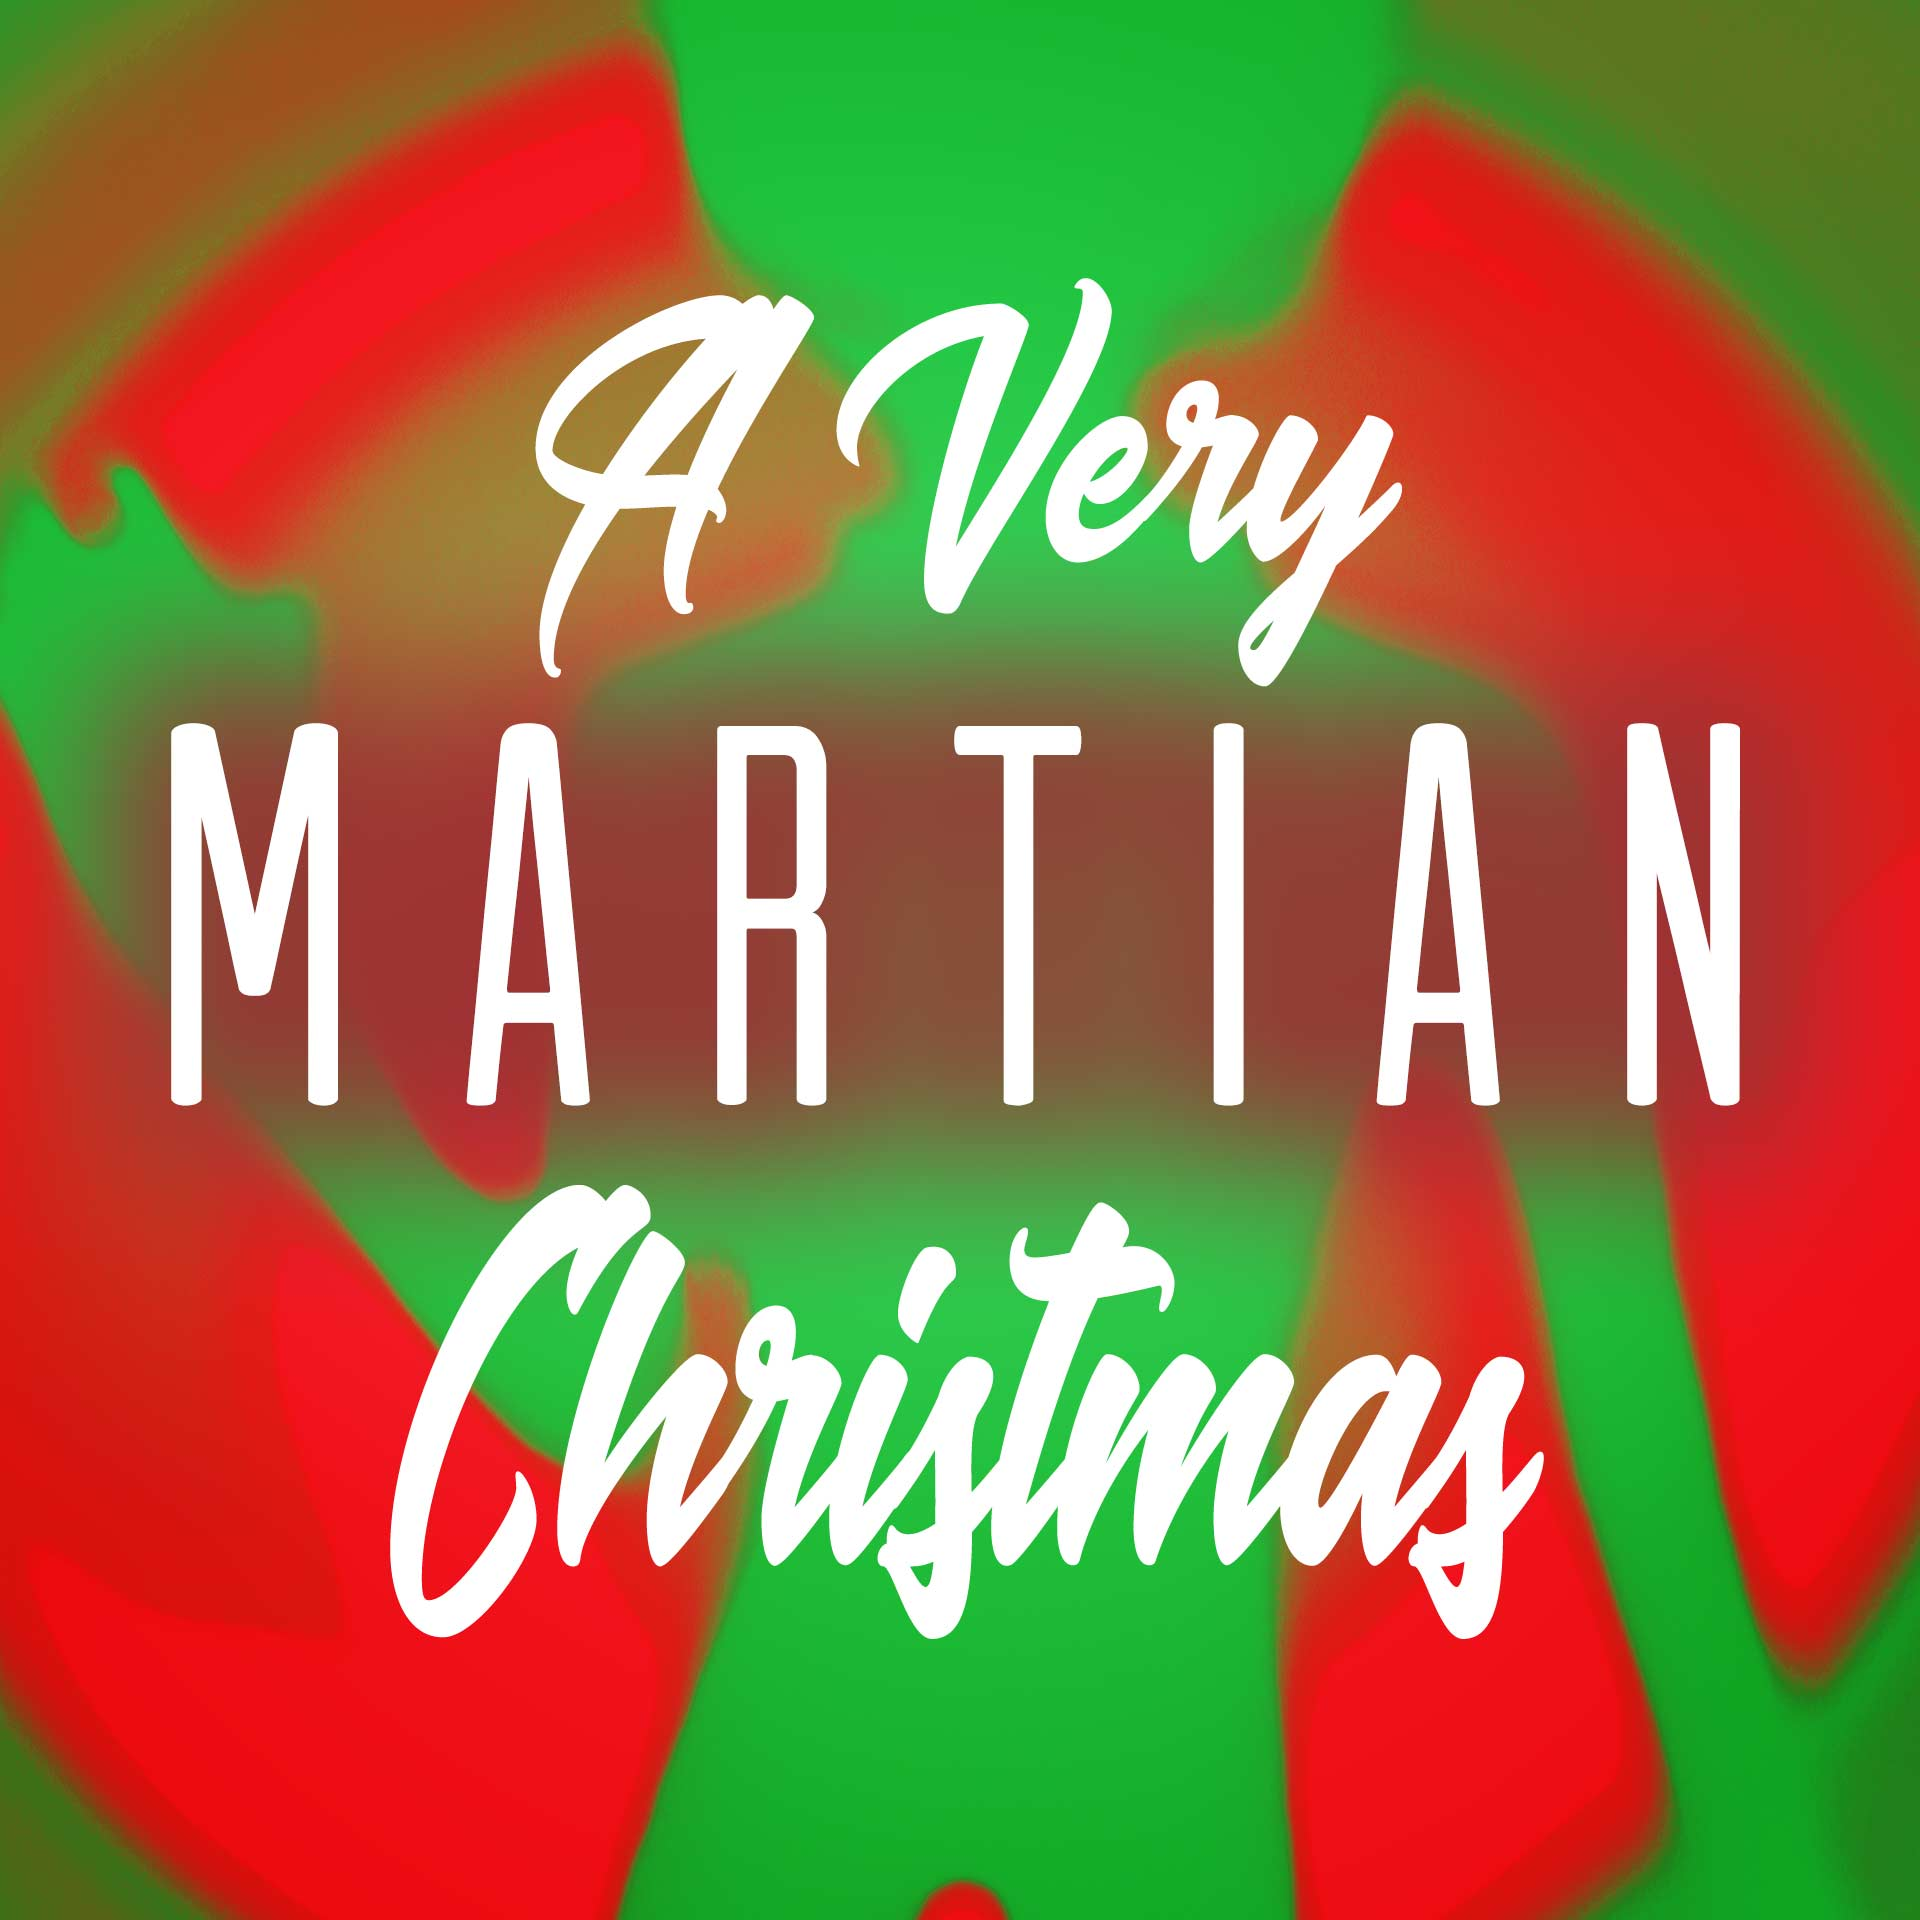 A Very Martian Christmas